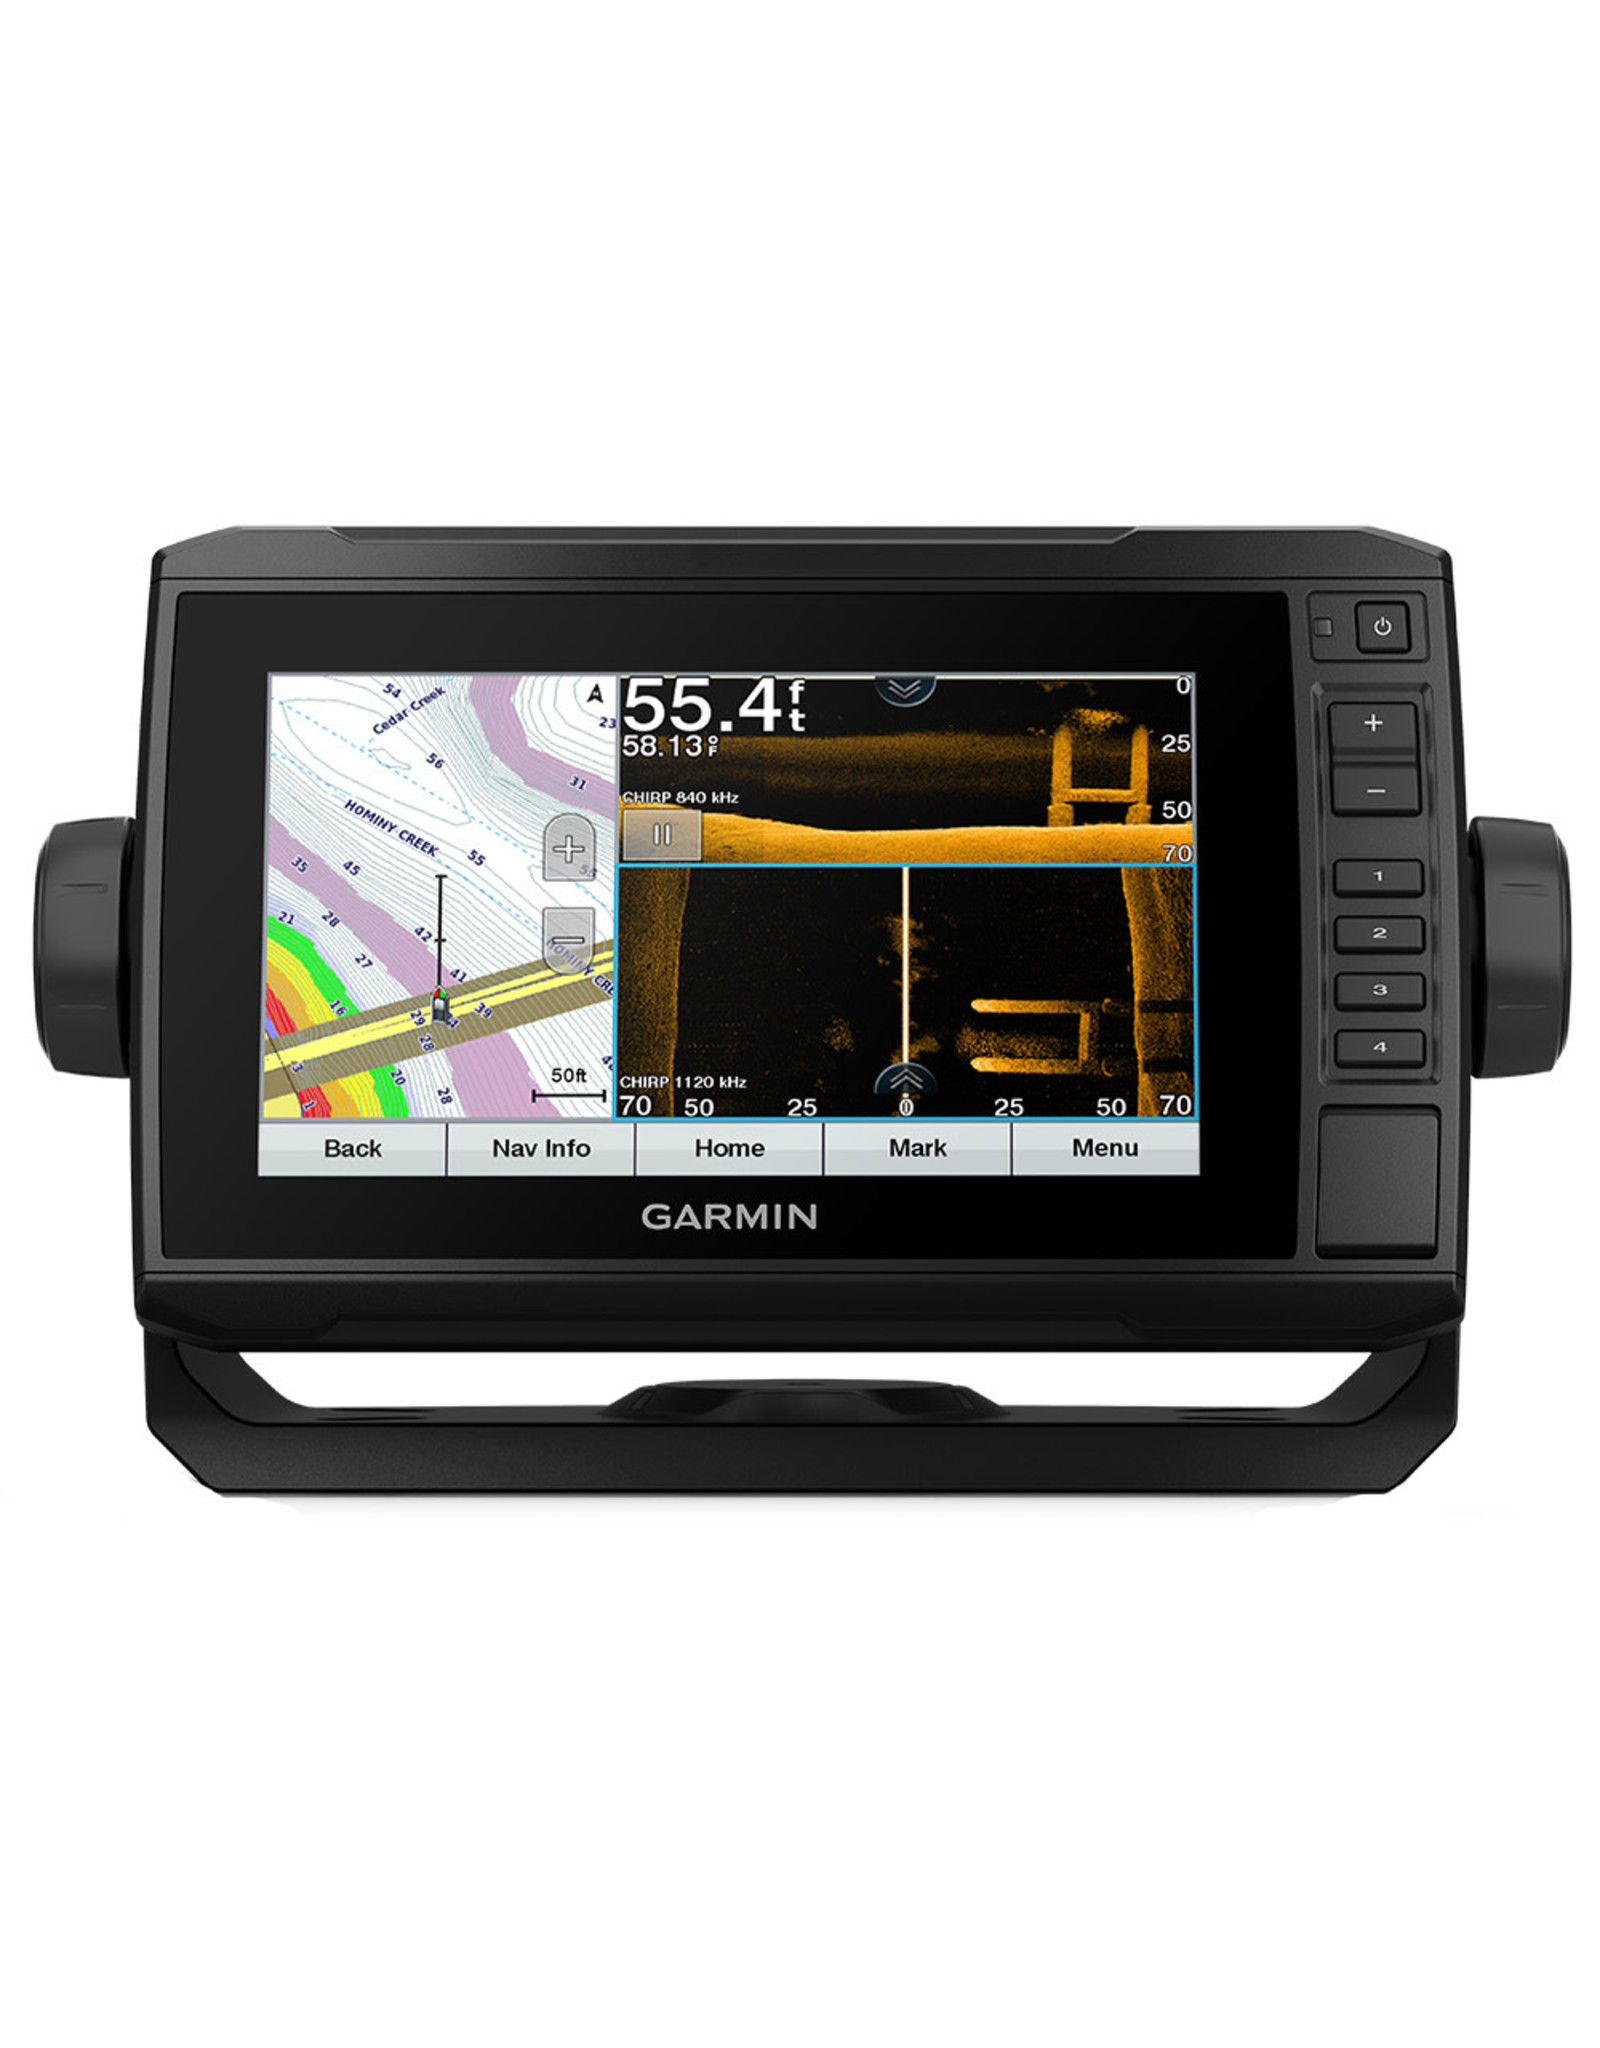 Garmin Echomap™ UHD 73cv US LakeVü g3 without transducer.